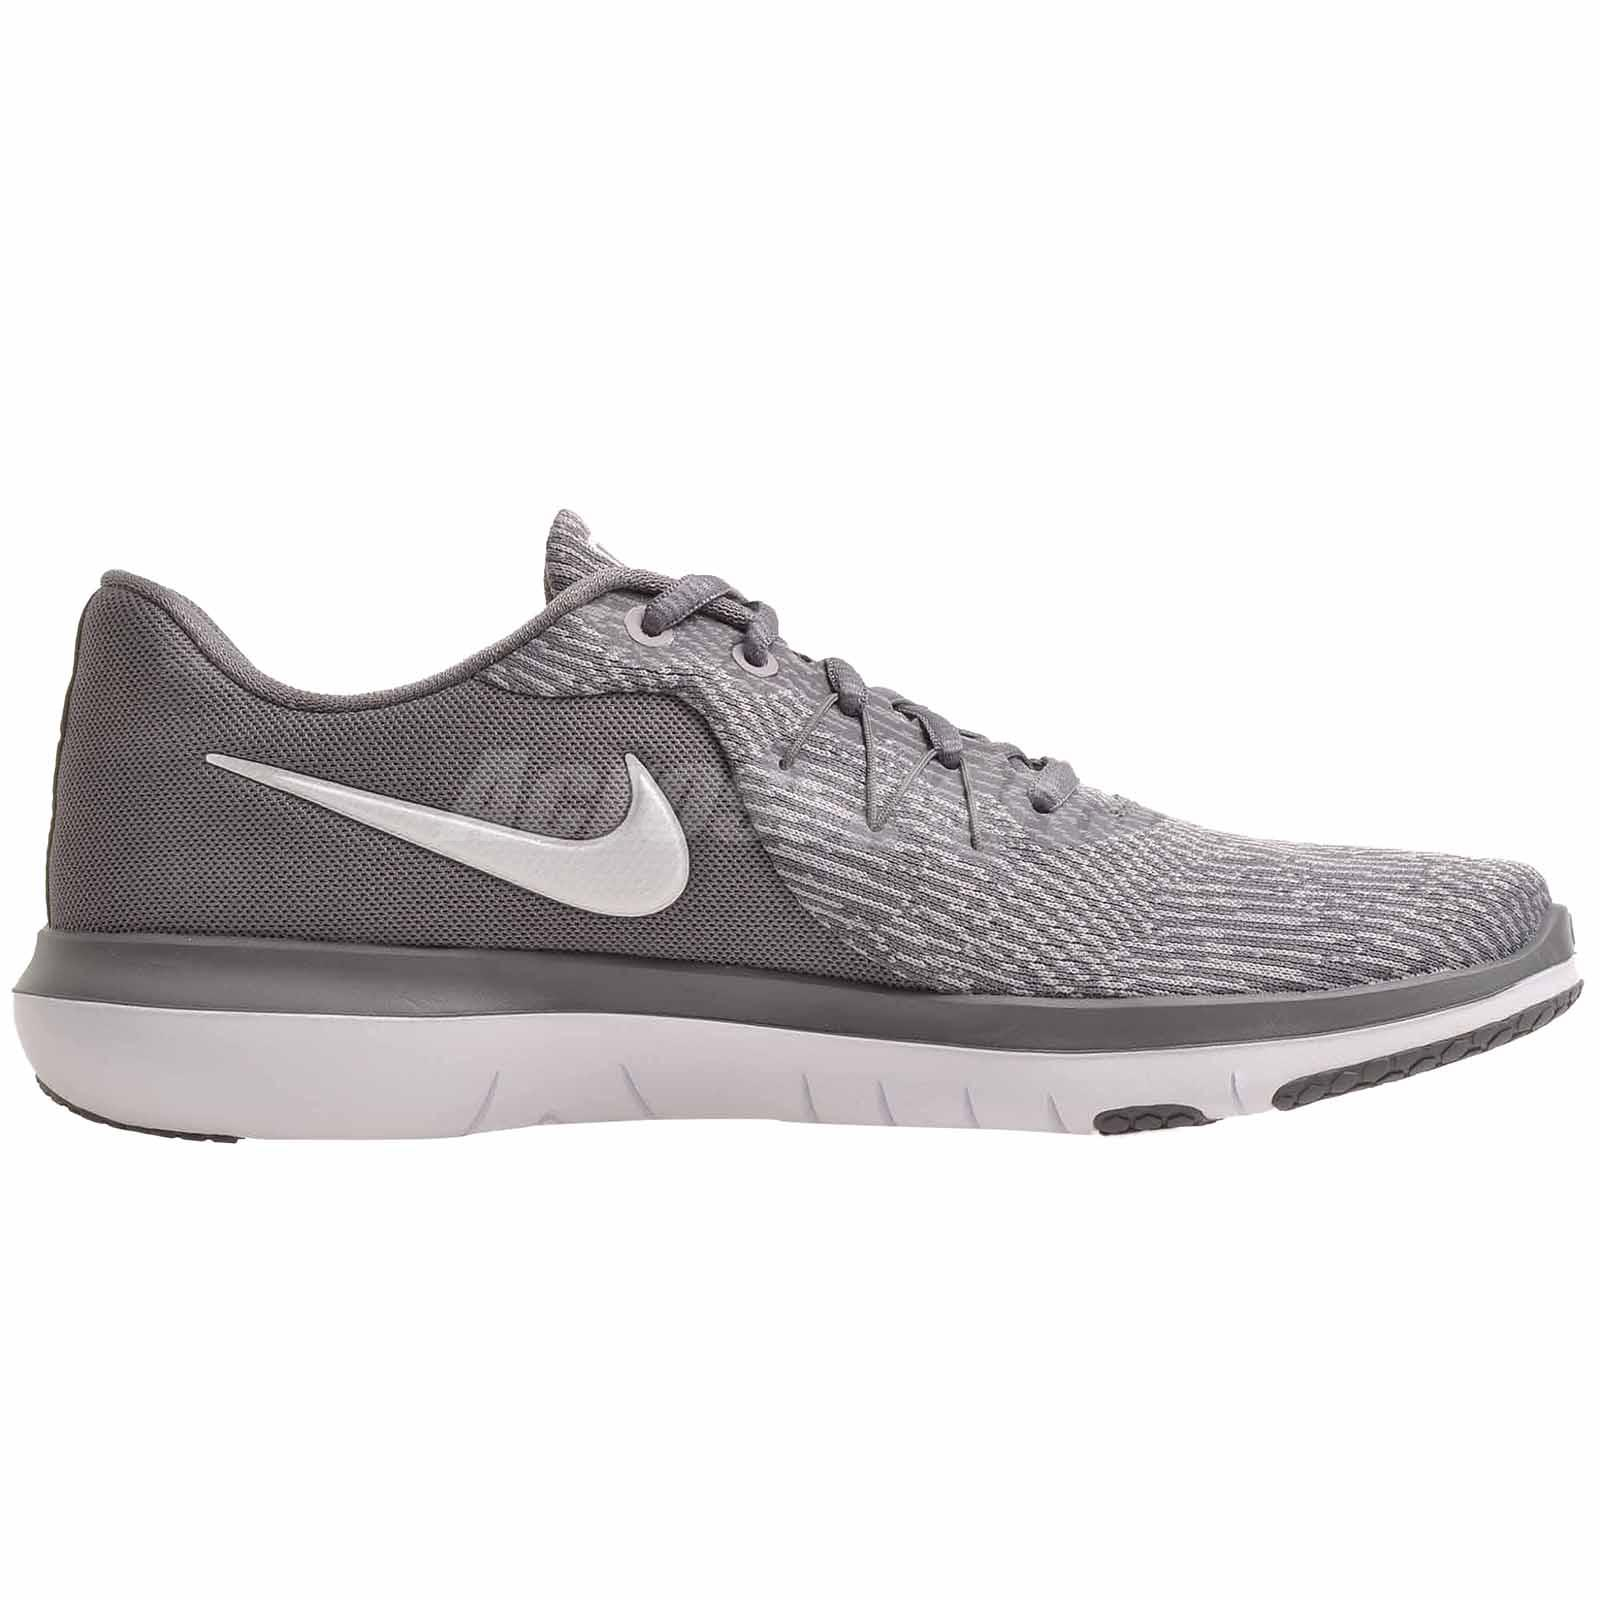 f7619ef282b Nike W Flex Supreme TR 6 Womens Cross Training Shoes Wide Grey ...